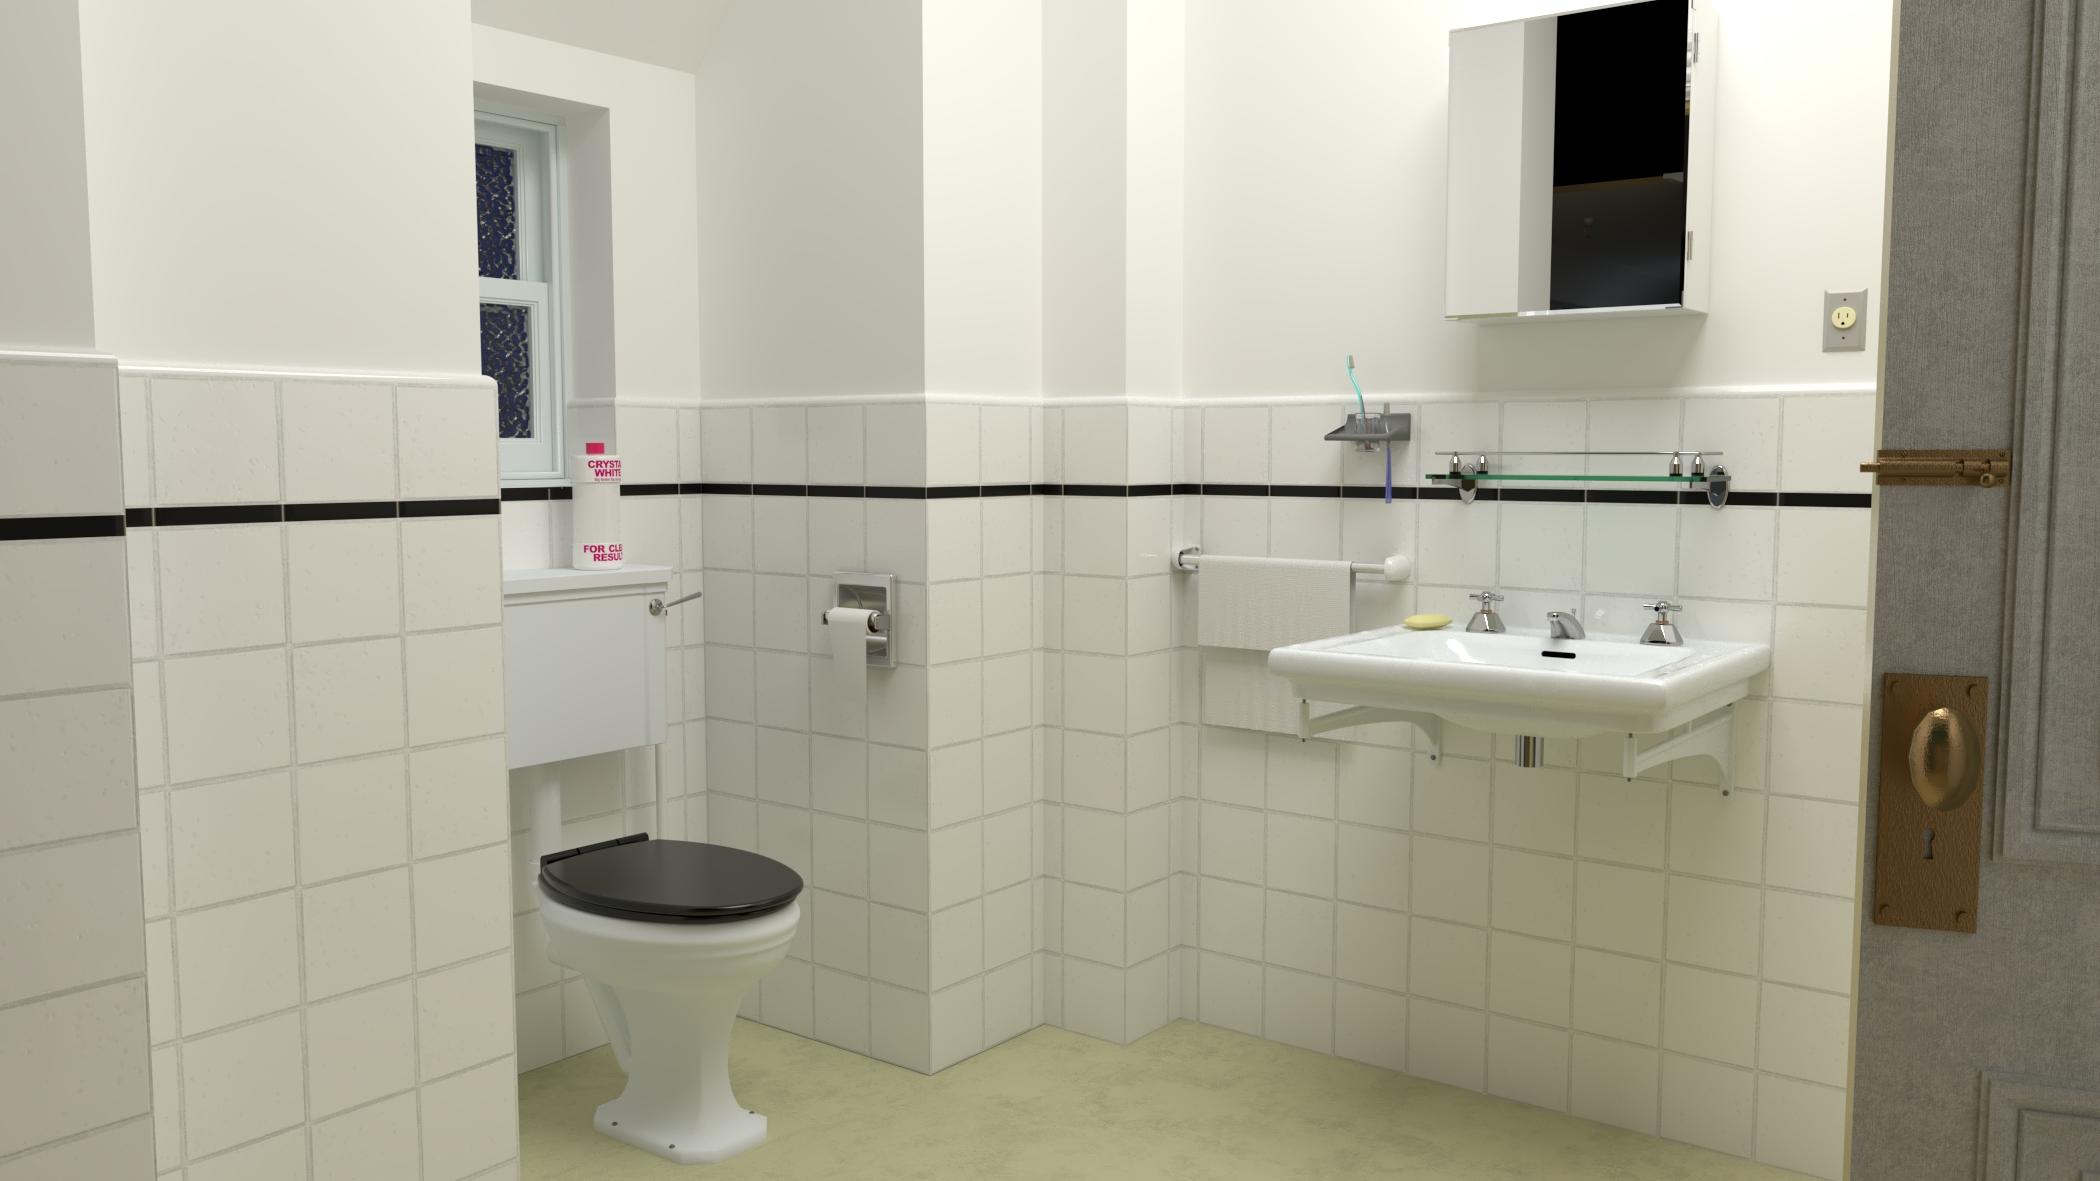 The bathroom of the Torrance family